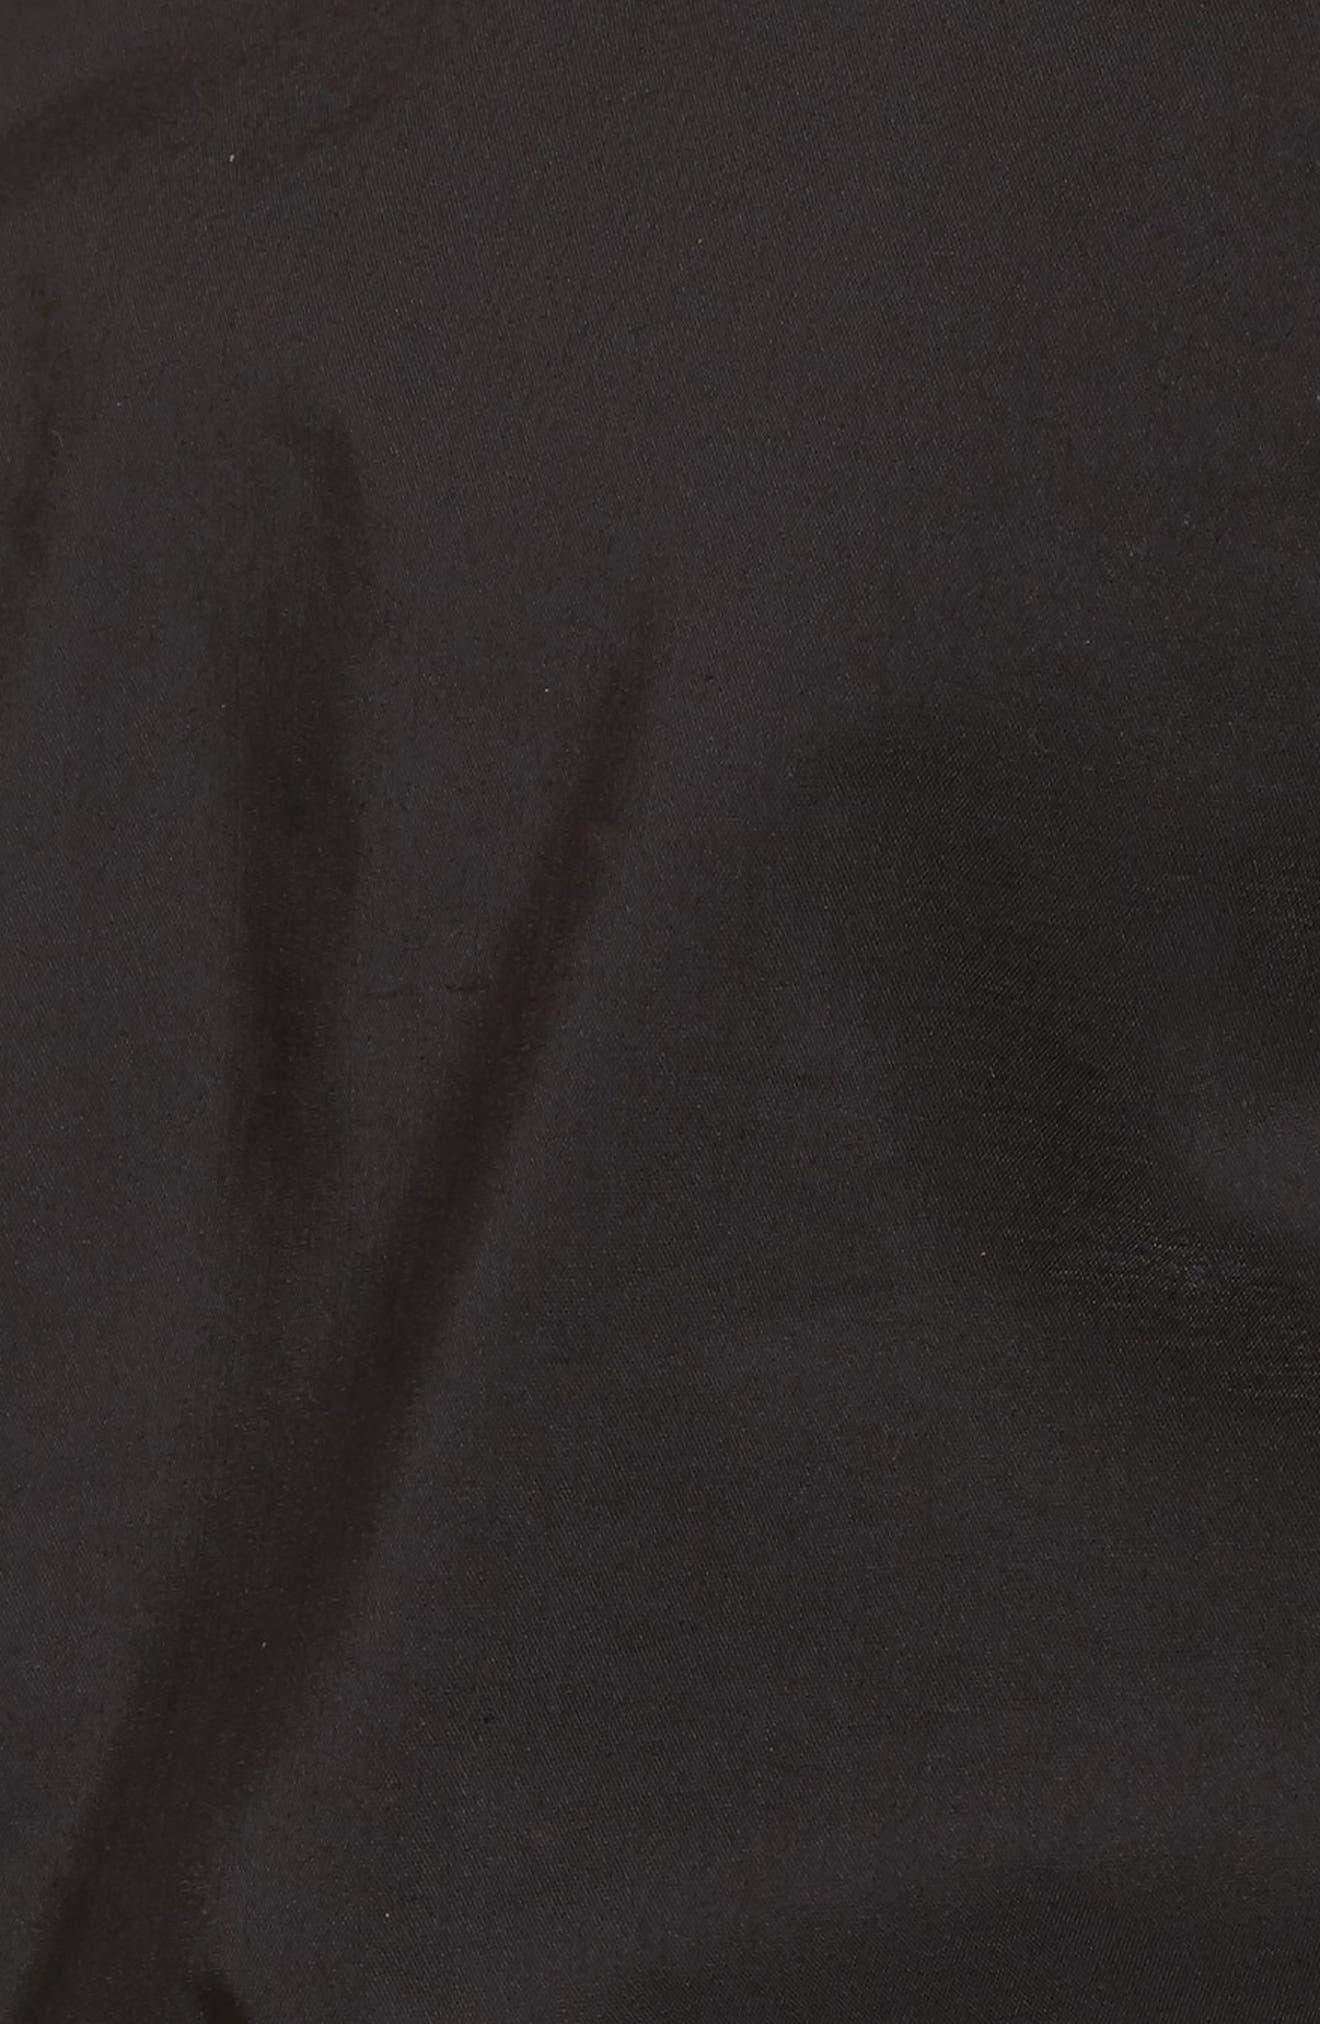 Ruffle One-Shoulder Blouse,                             Alternate thumbnail 5, color,                             Black